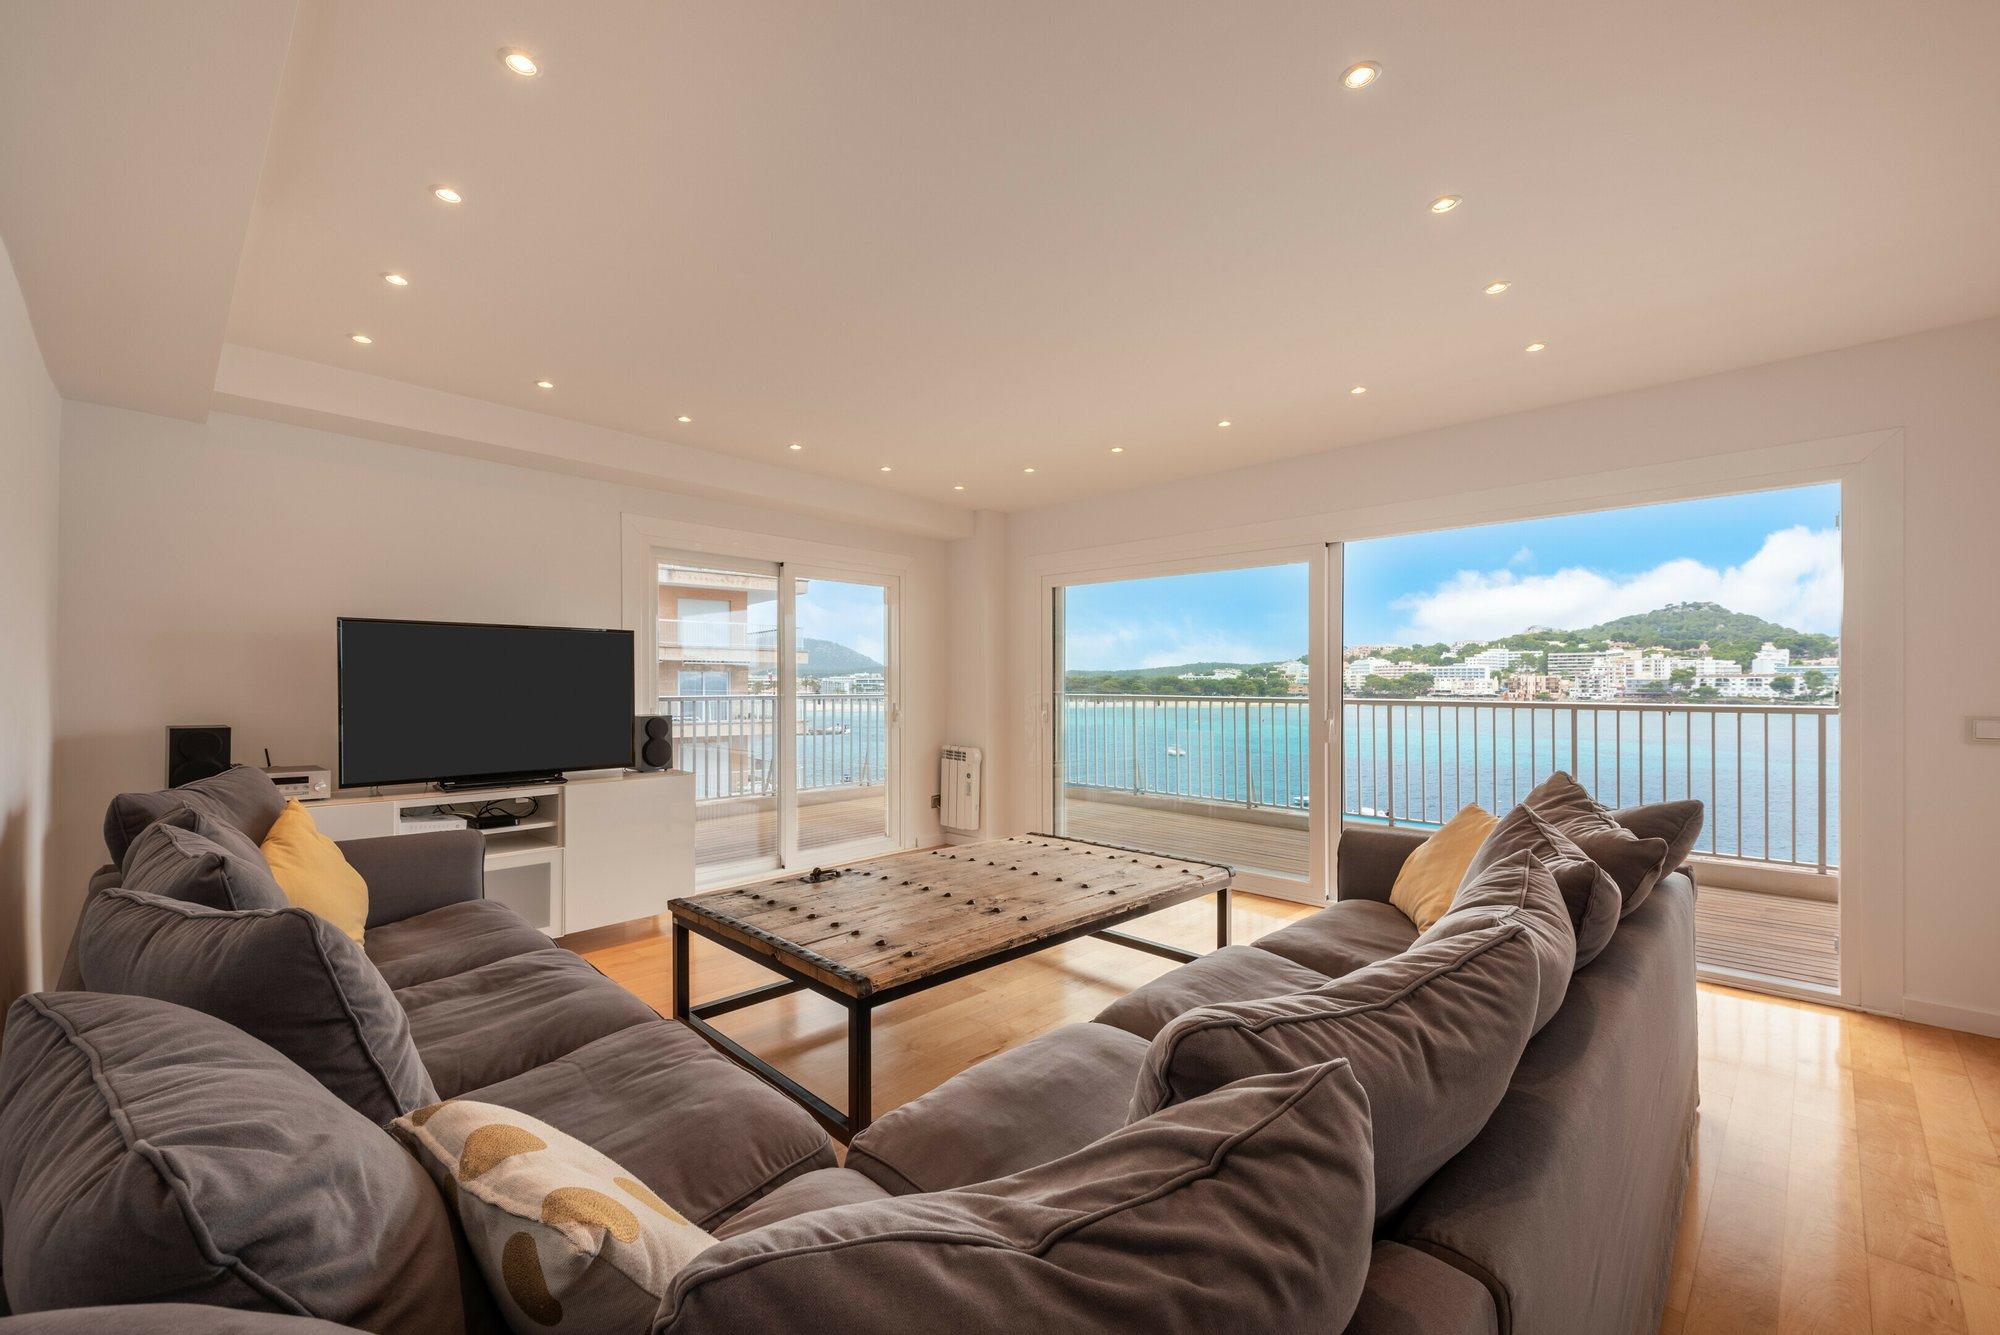 Apartment in Santa Ponça, Balearic Islands, Spain 1 - 11498533